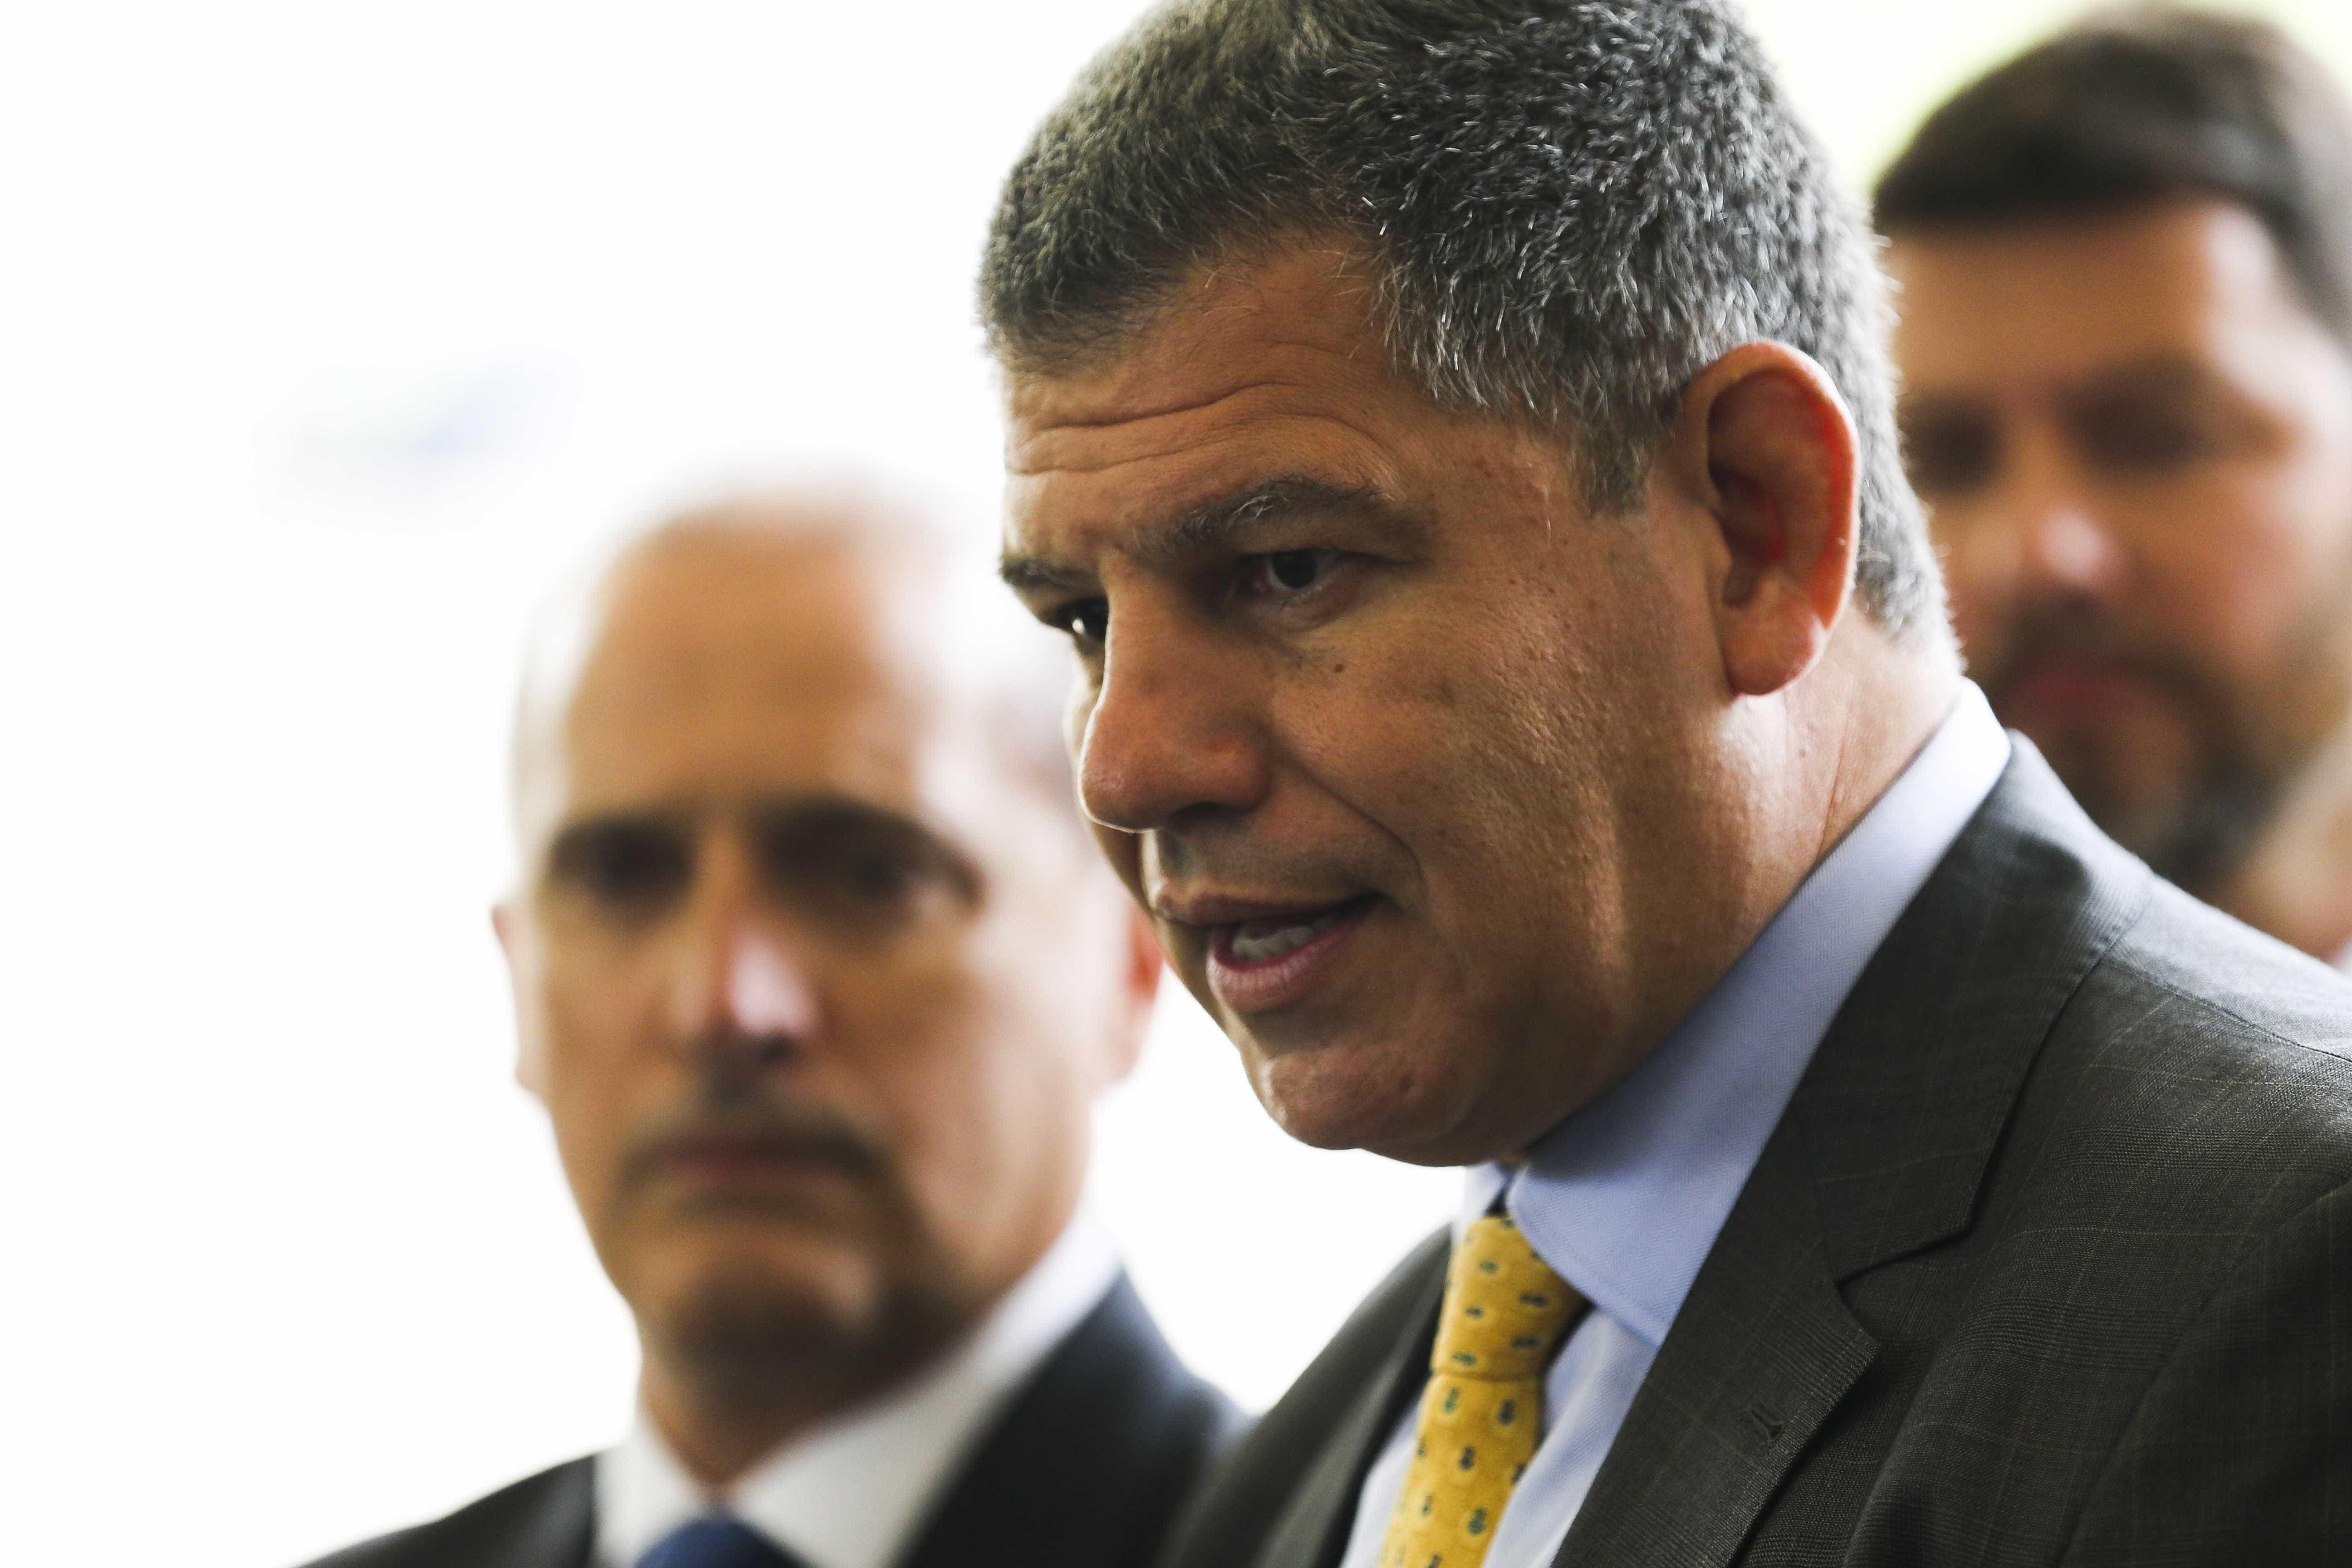 Bebianno diz que Carlos Bolsonaro 'fez macumba psicológica no pai'